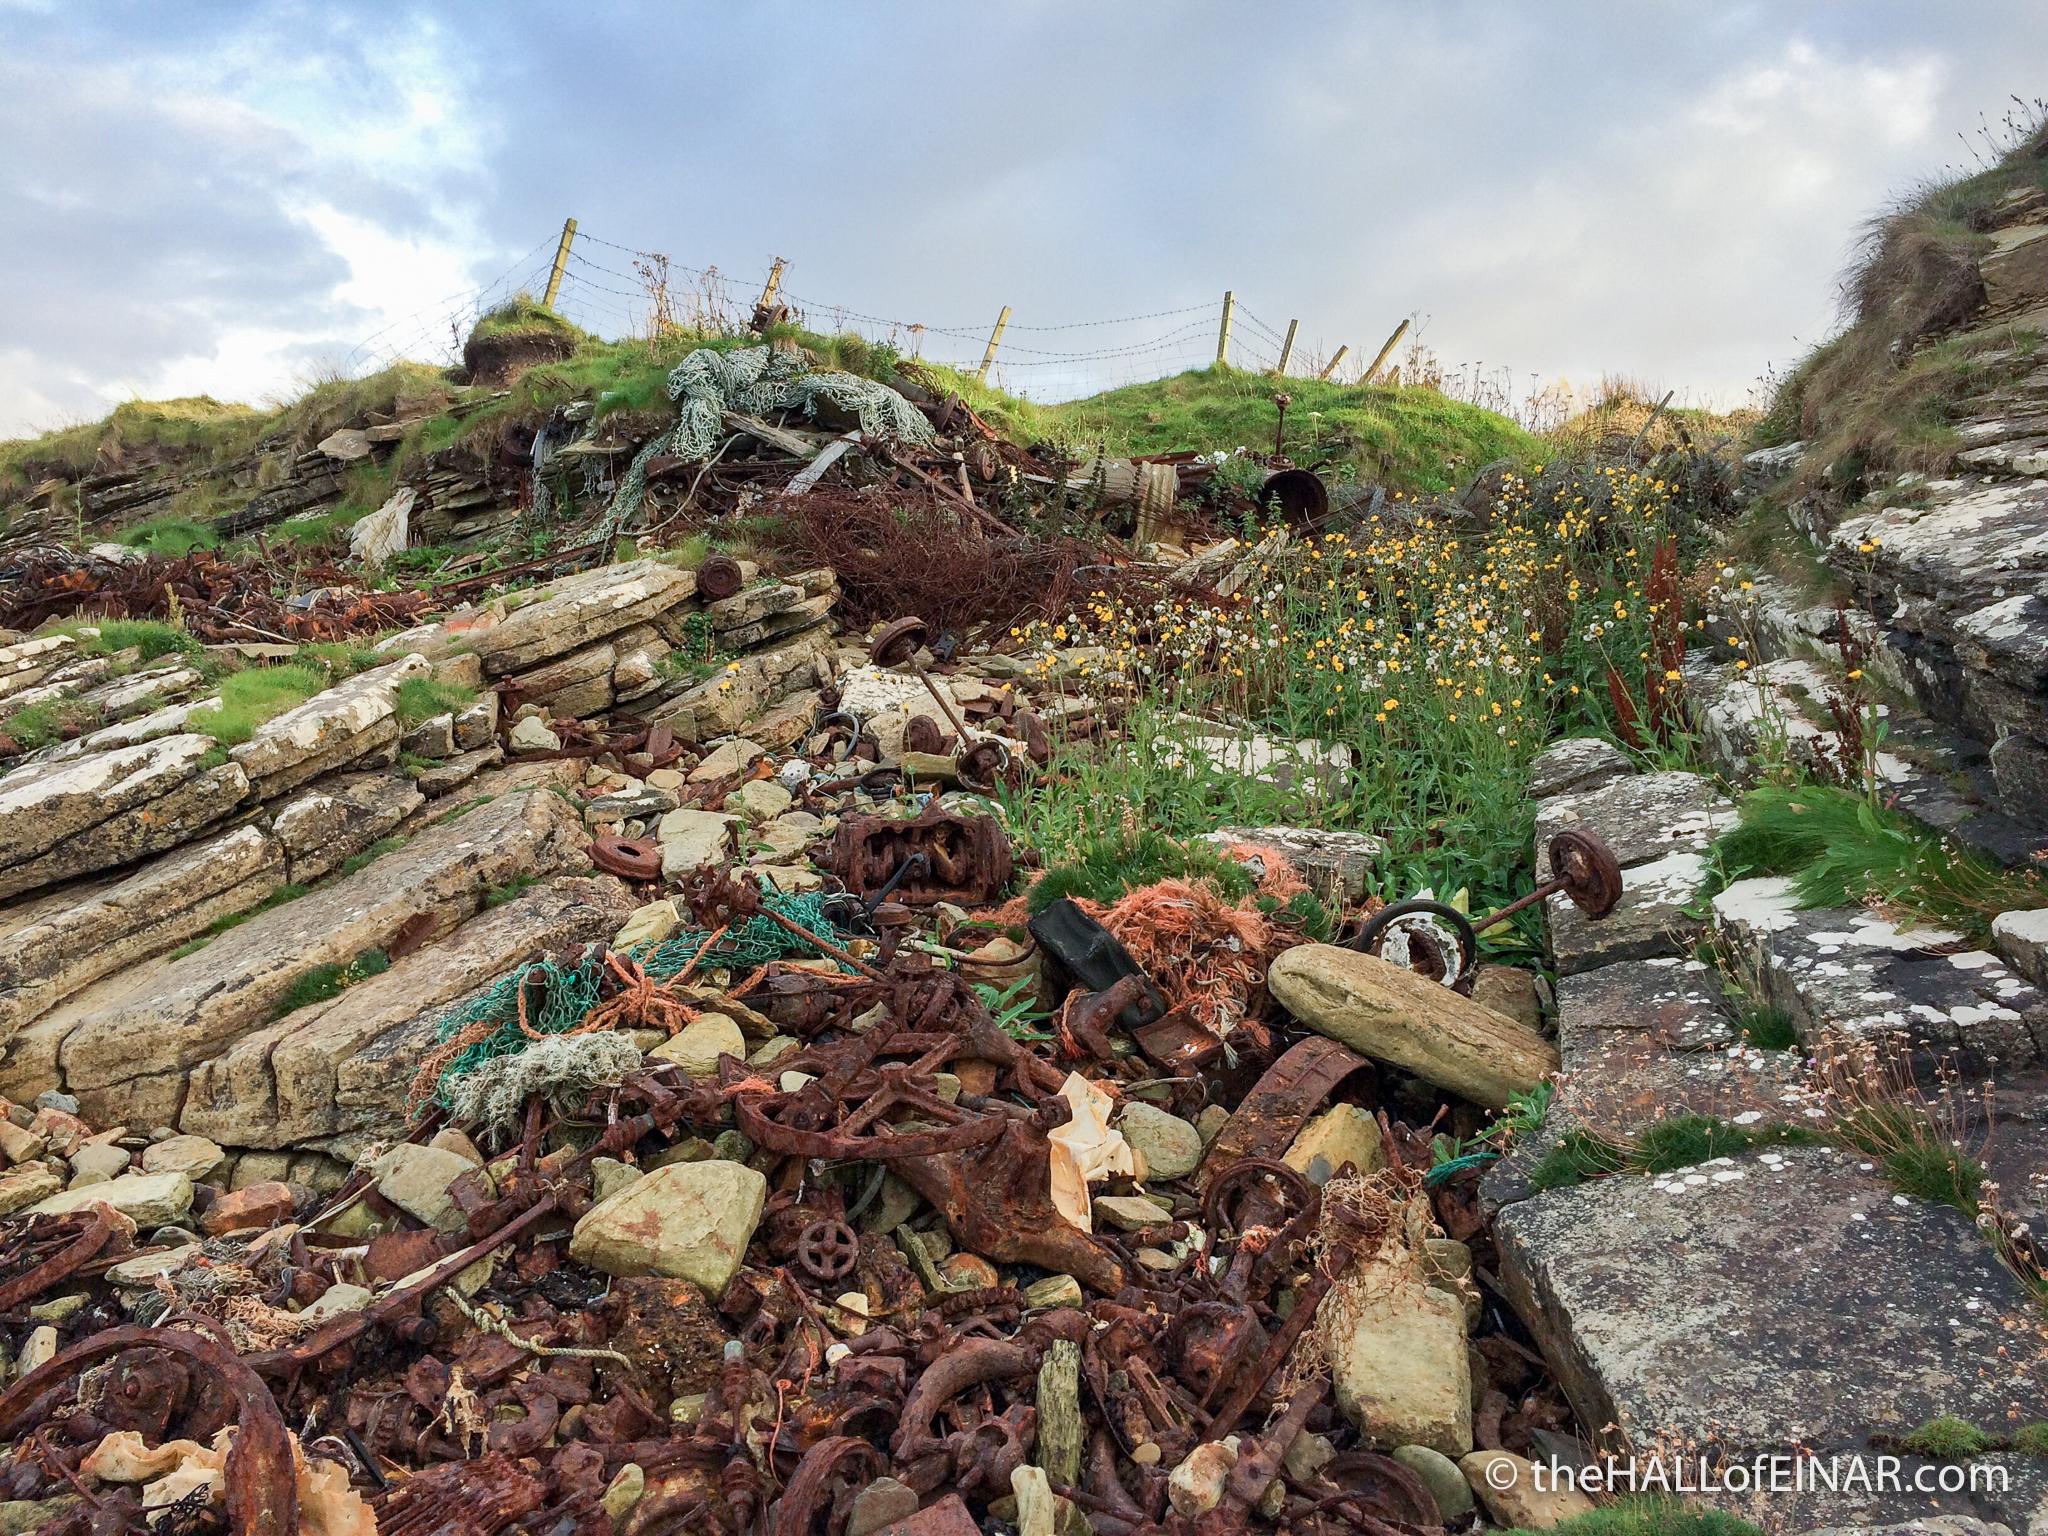 Metal beachcombing - The Hall of Einar - photograph (c) David Bailey (not the)